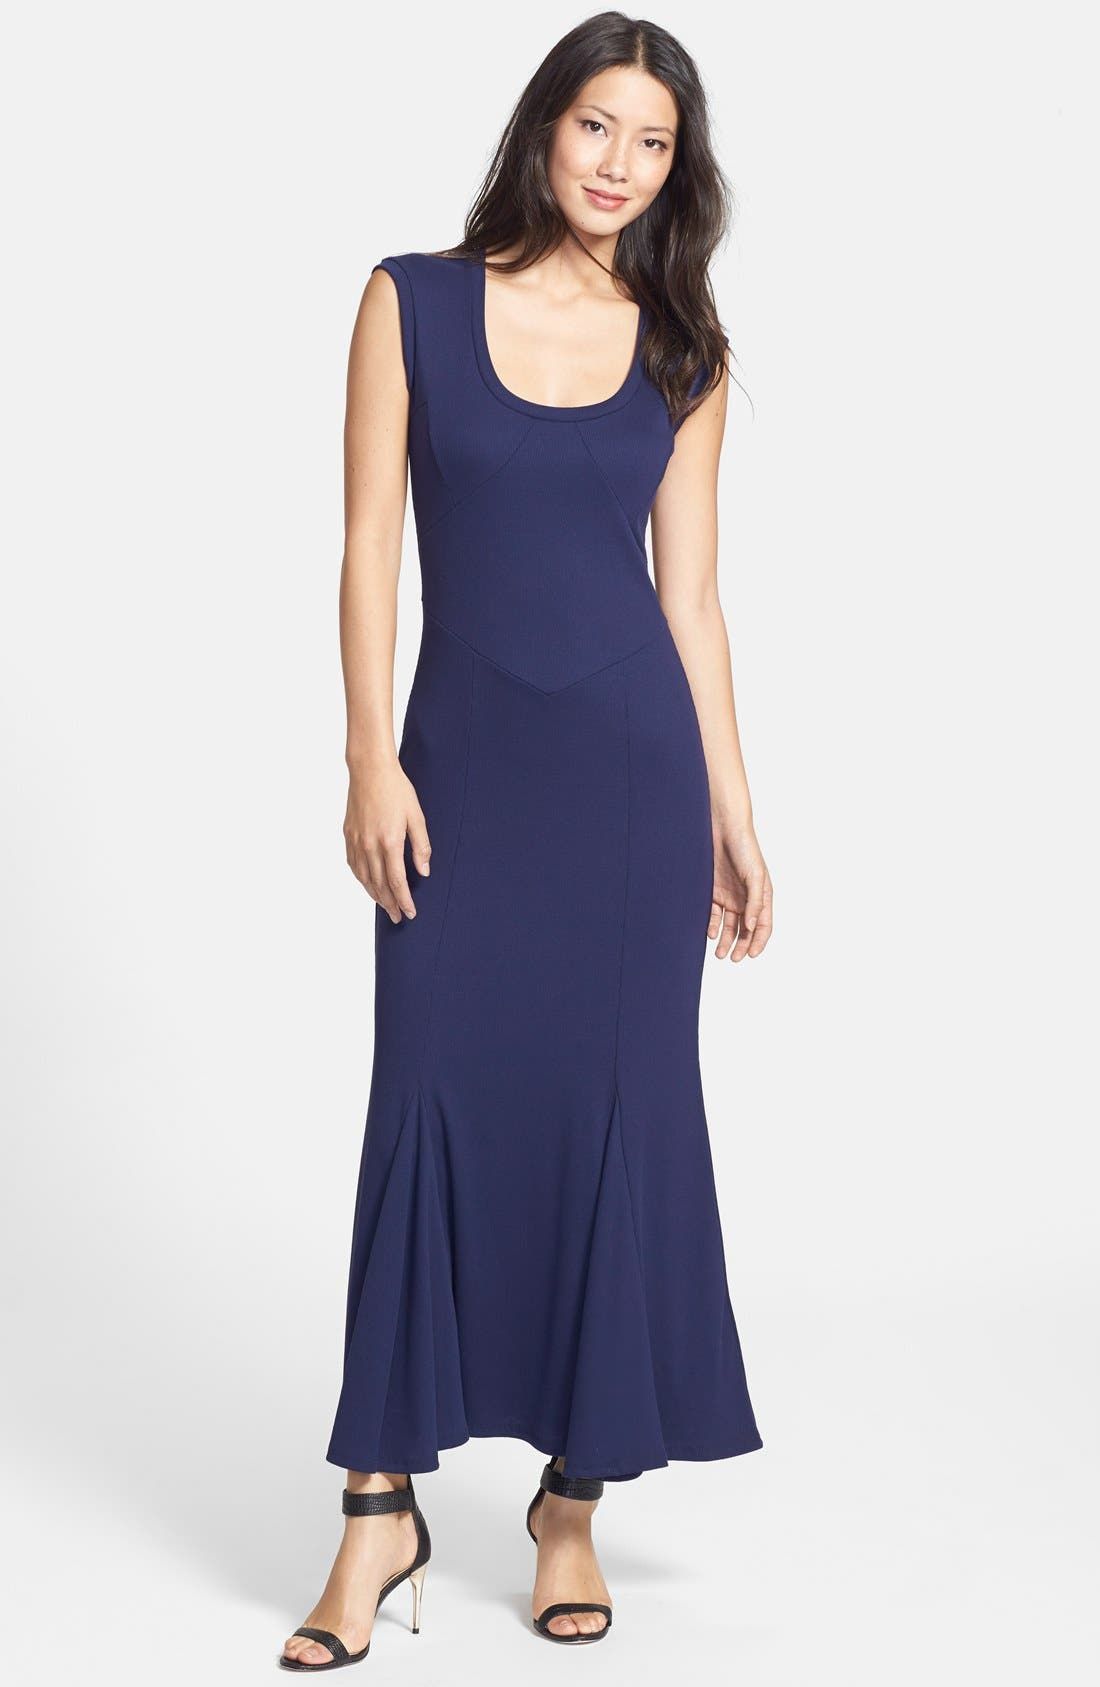 'Amber' Scoop Neck Maxi Dress,                             Main thumbnail 1, color,                             410